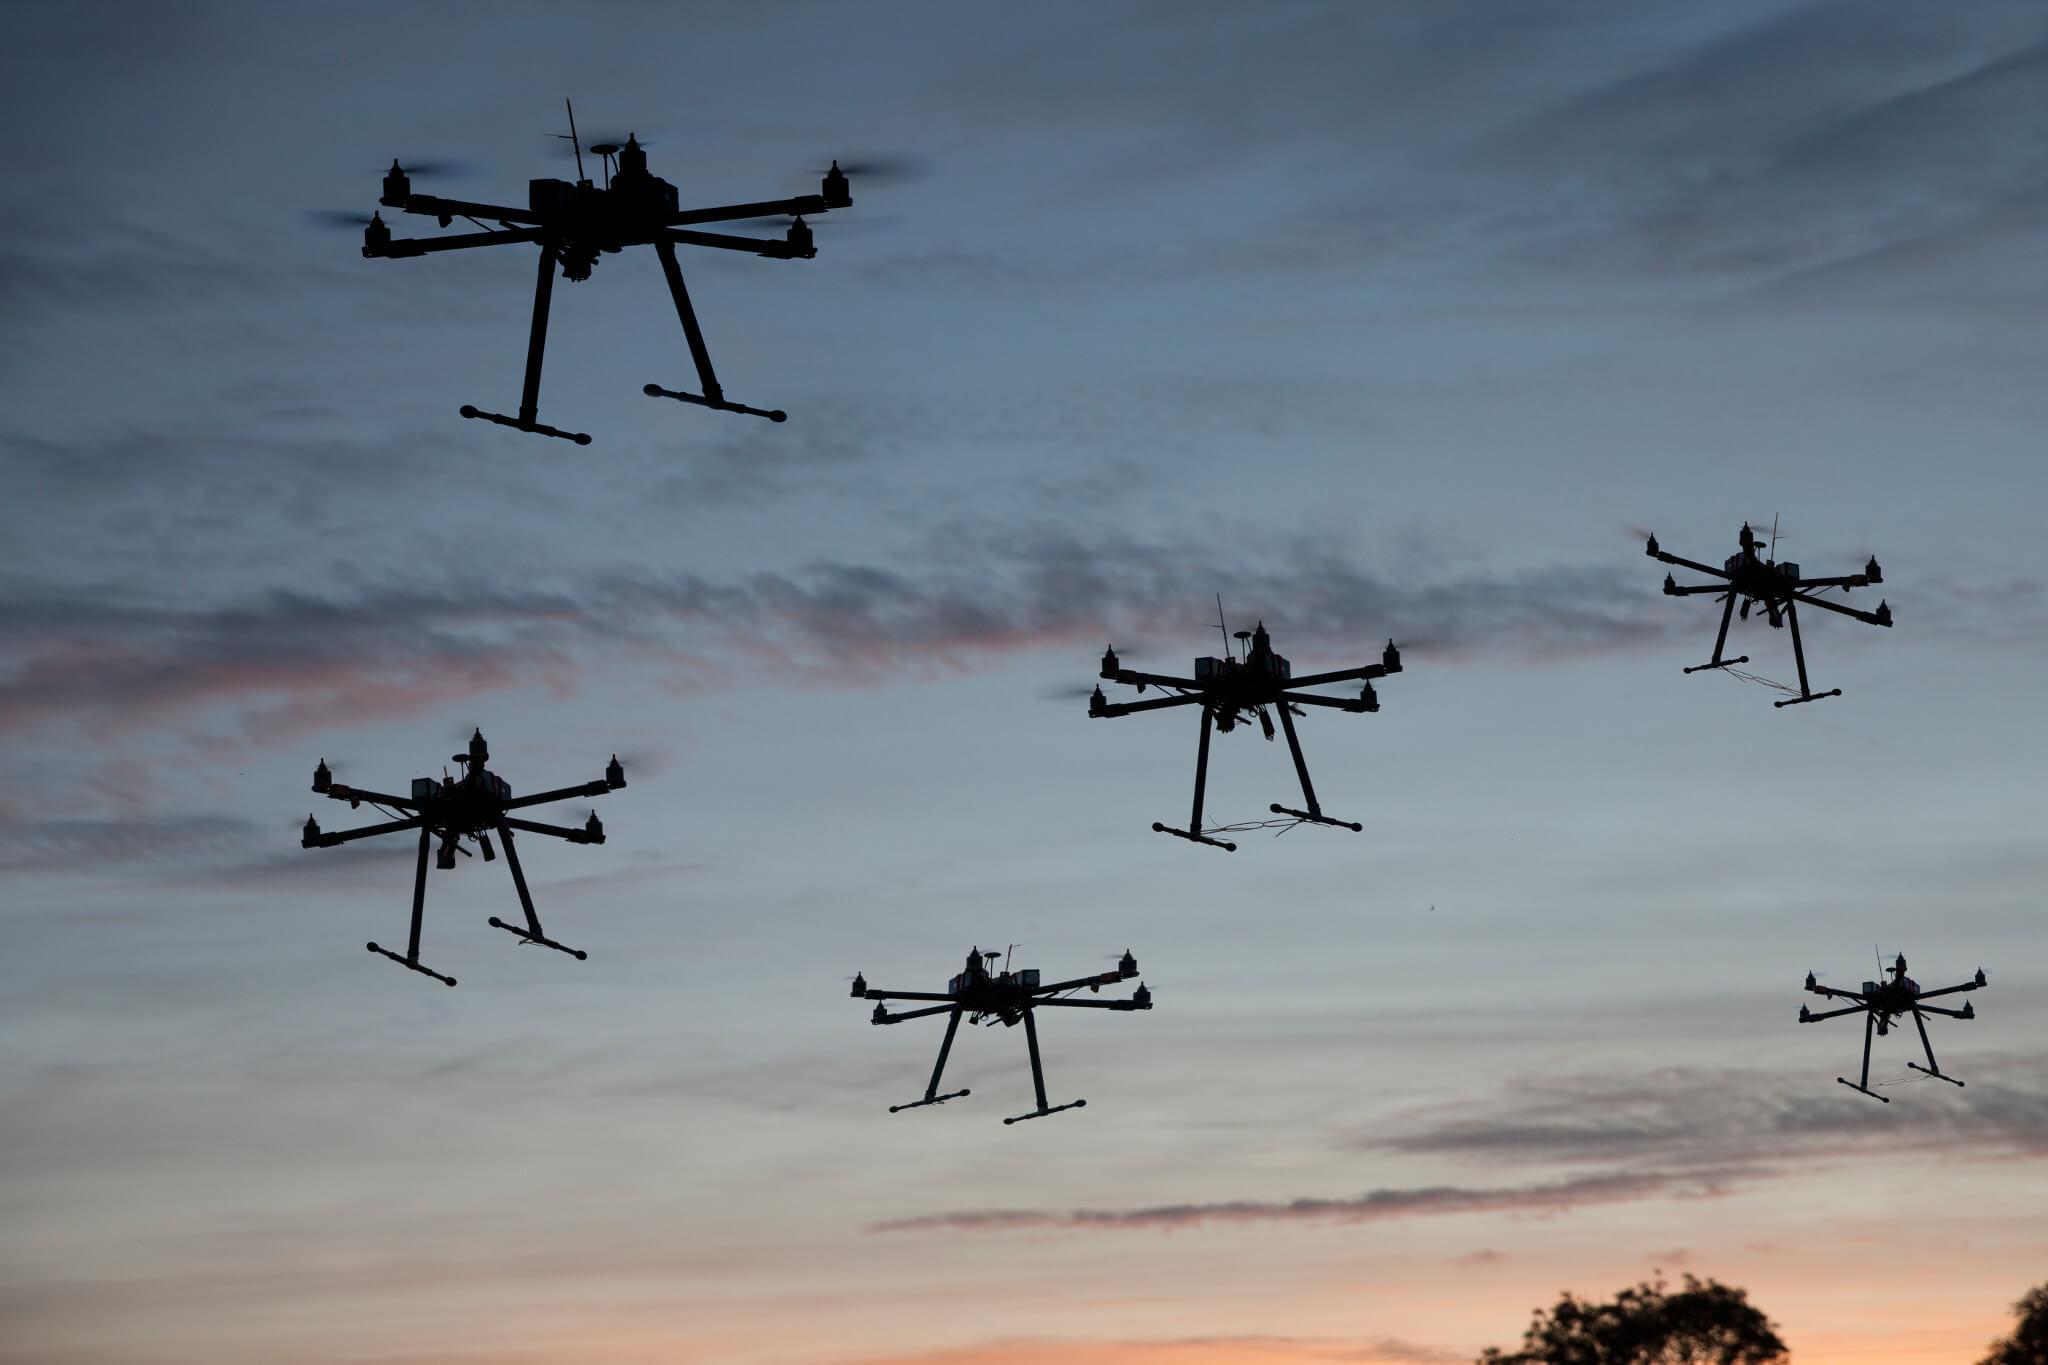 RF sensing of drones